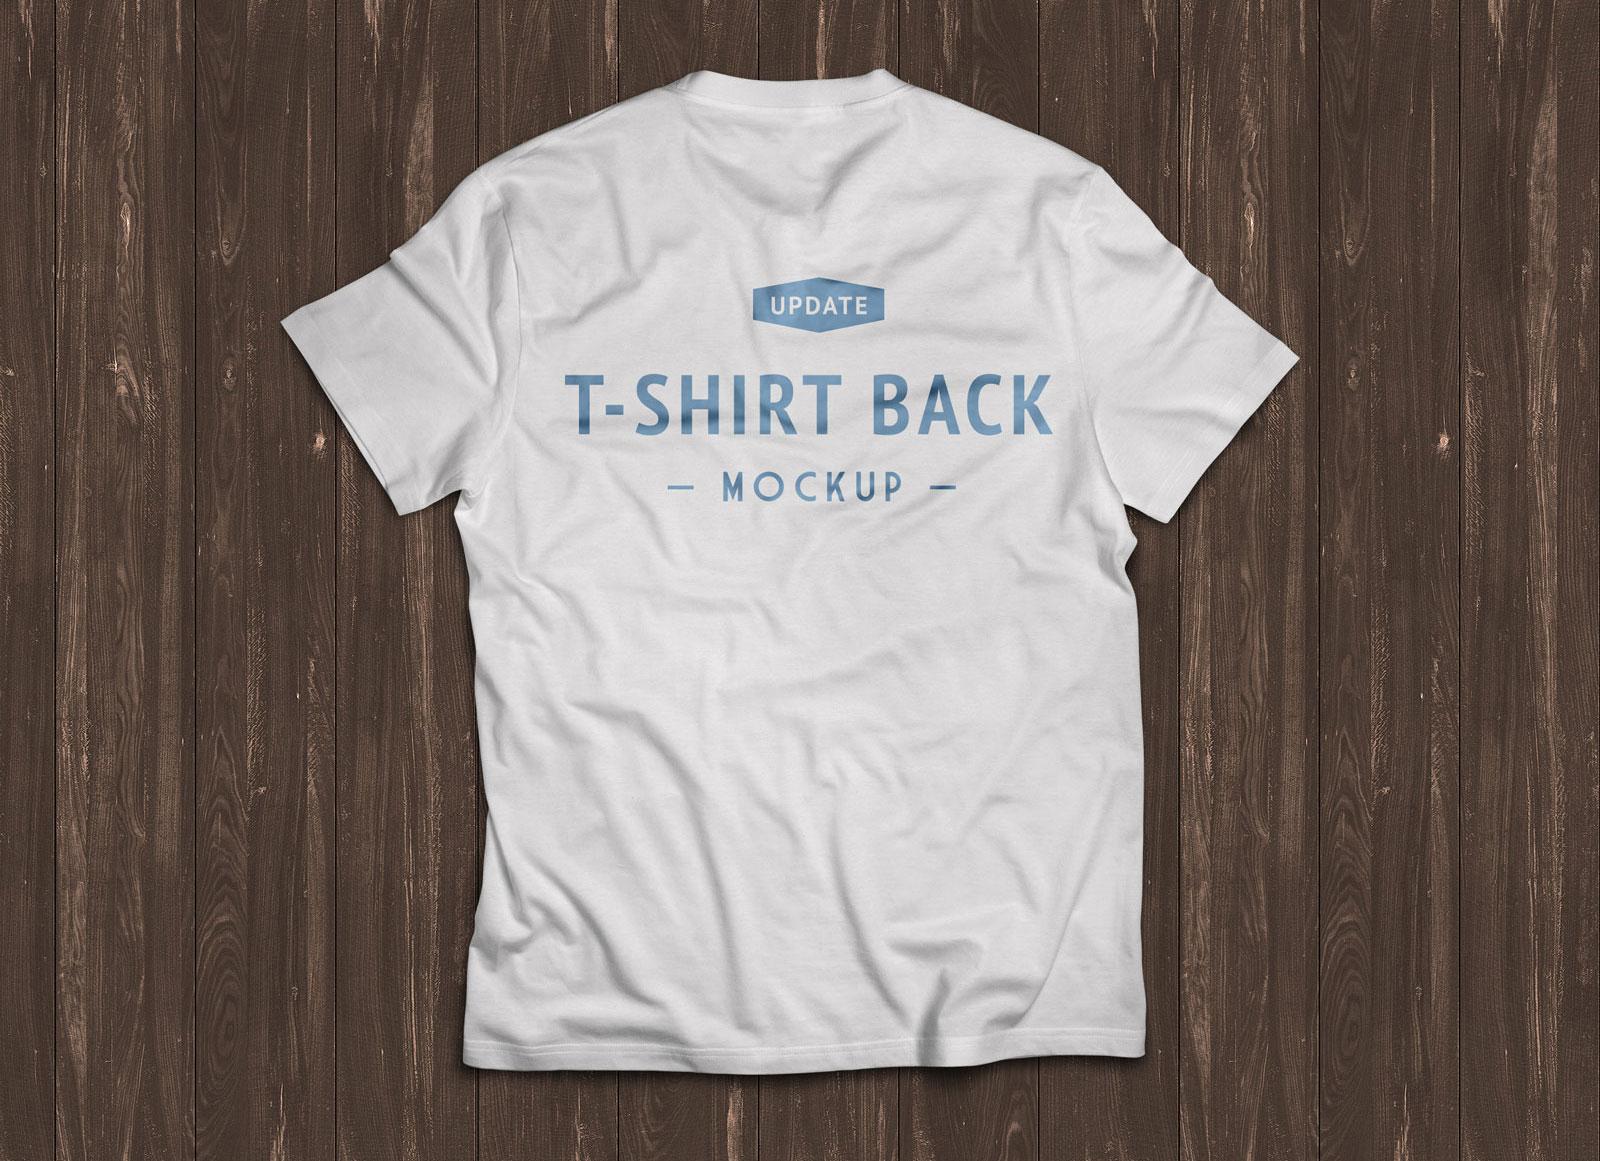 free half sleeves black white t shirt mockup psd files